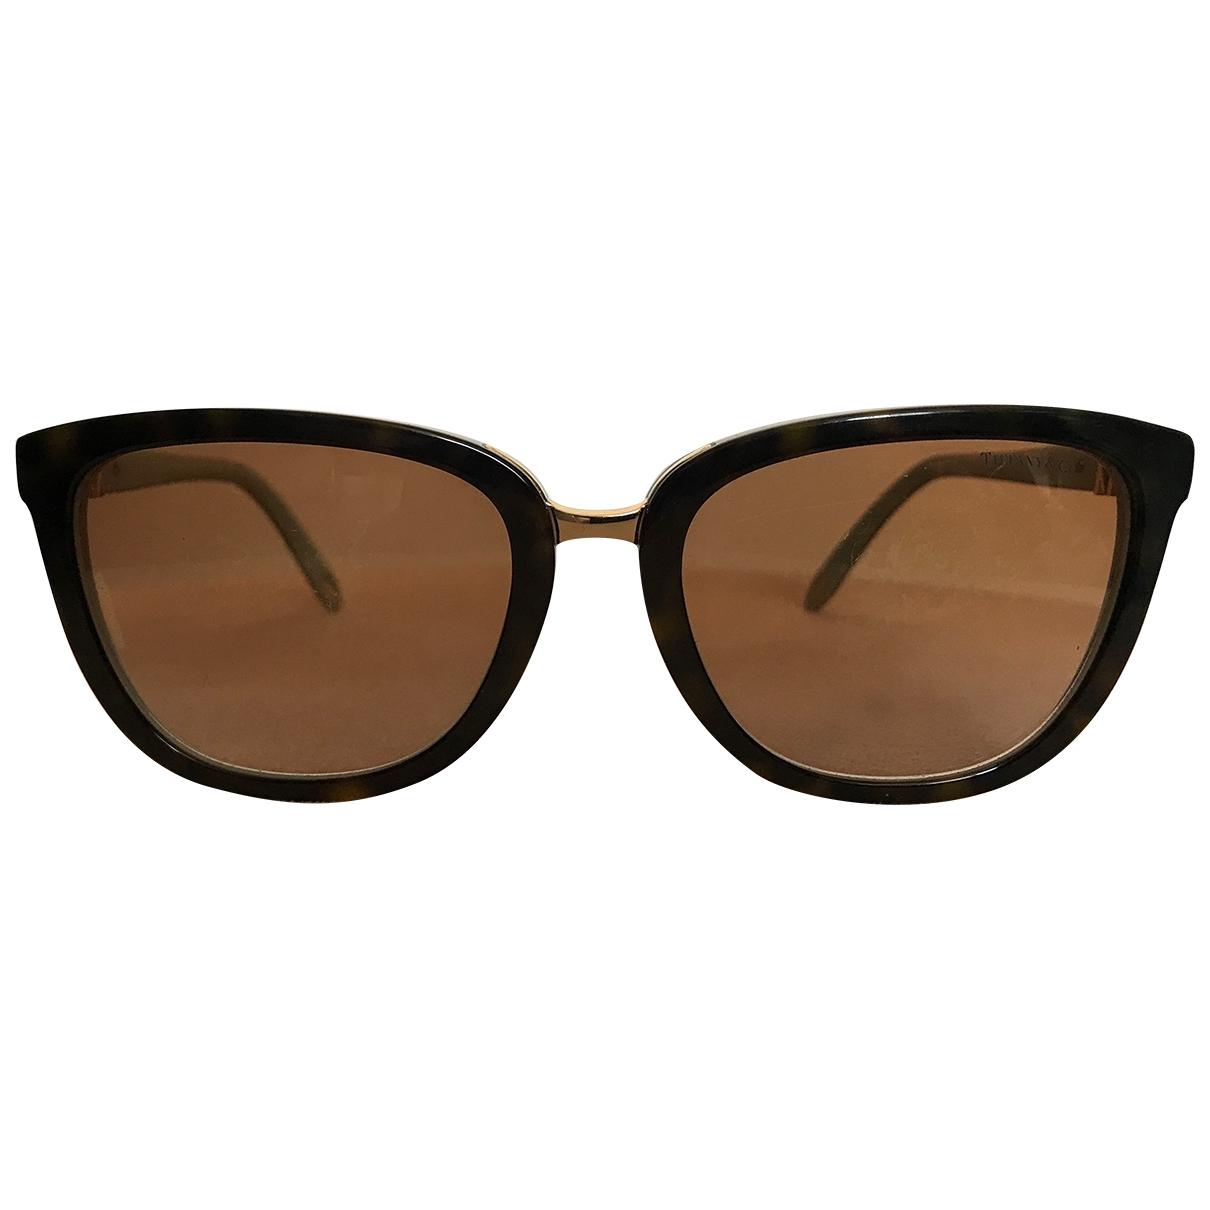 Gafas oversize Tiffany & Co